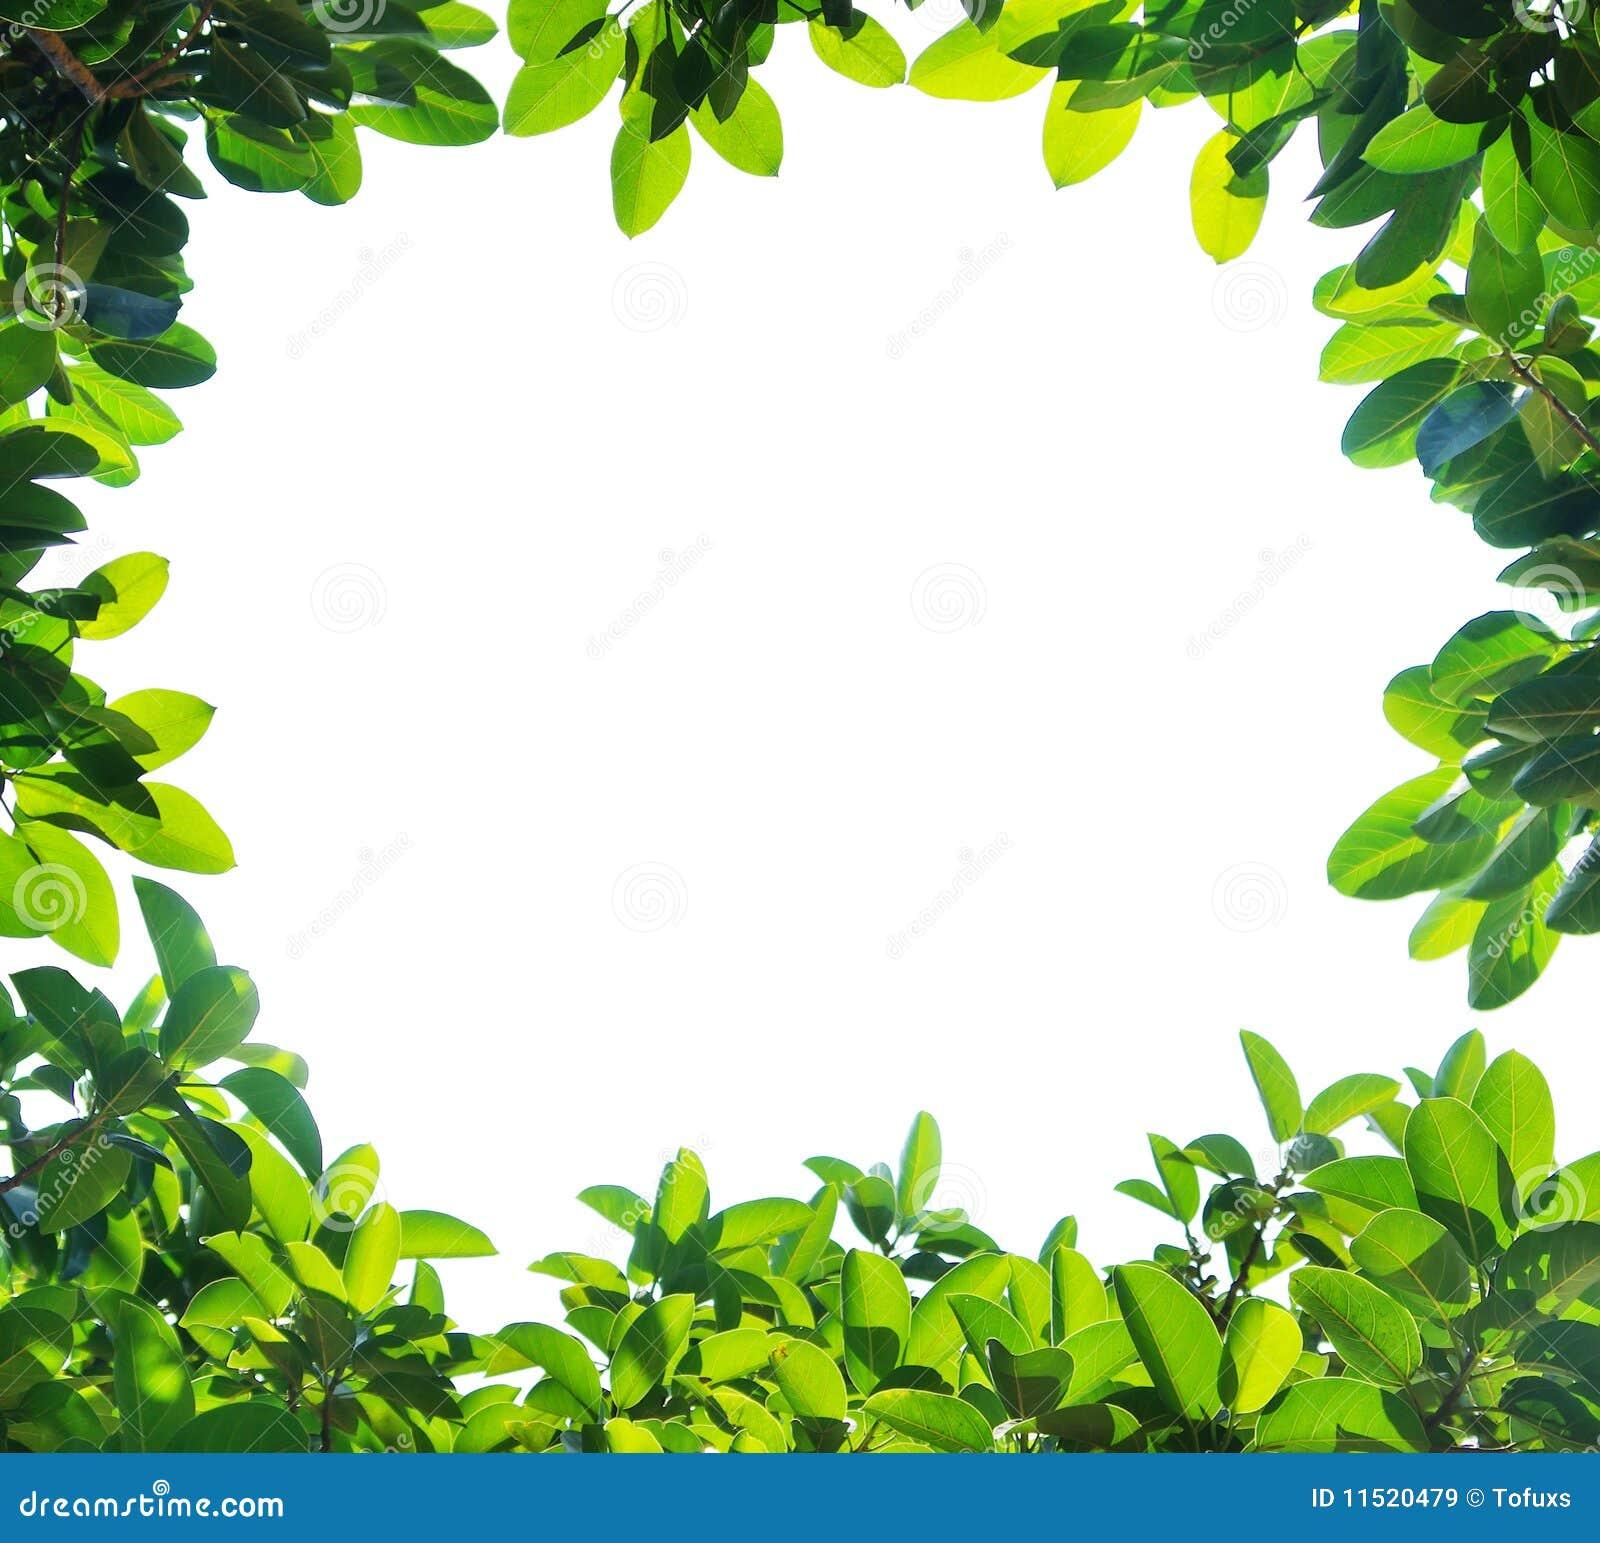 Green leaf border,Isolated on white background.